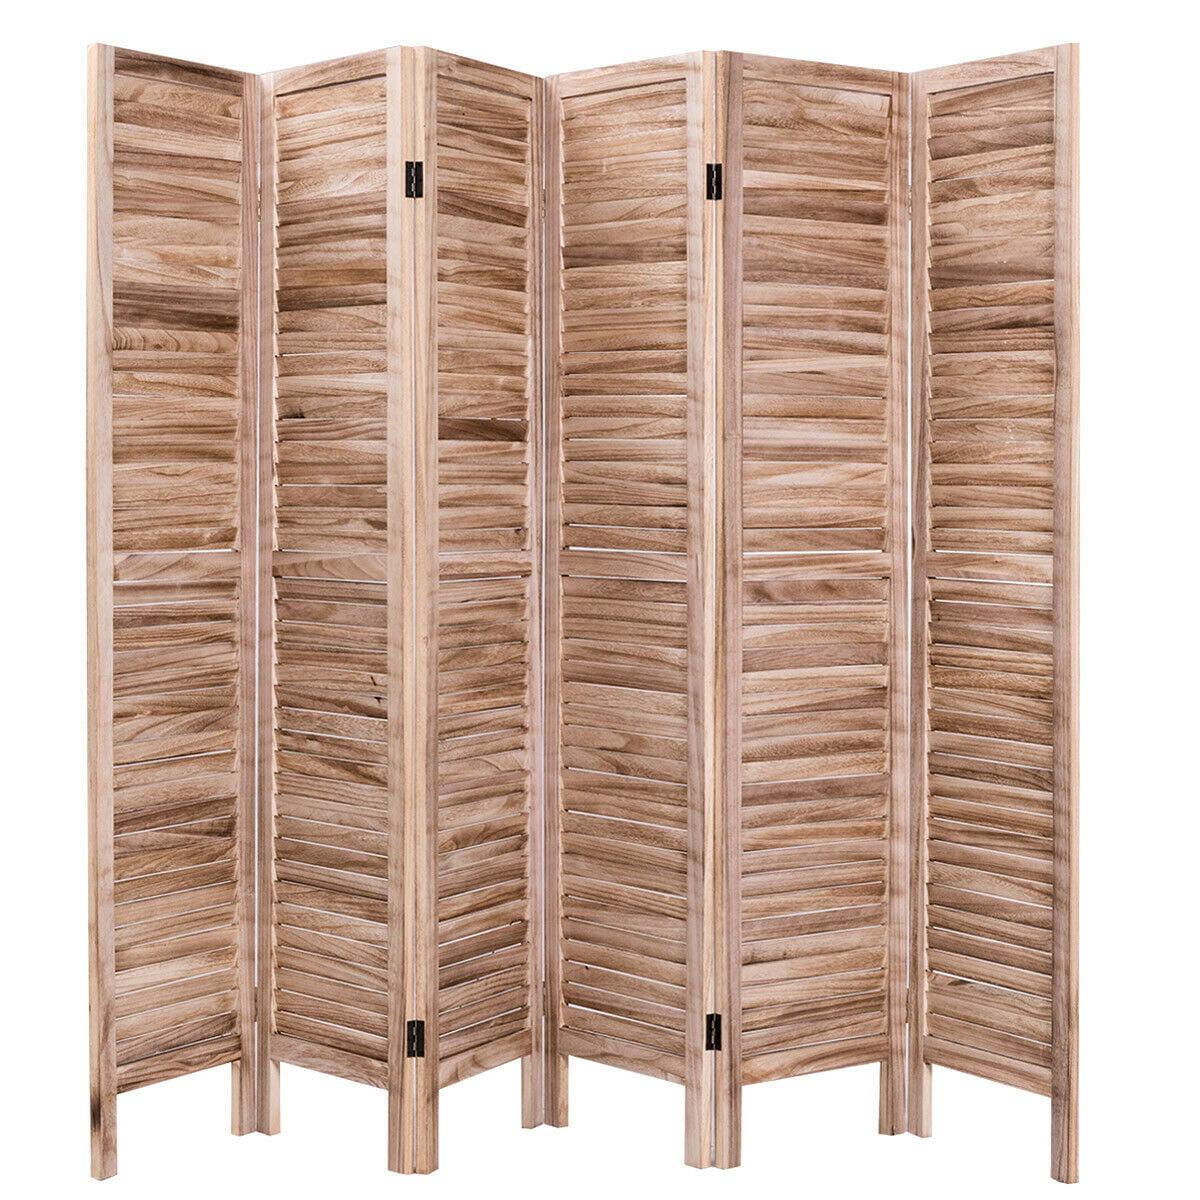 Costway 67'' High 6 Panel Room Divider Furniture Classic Venetian Wooden Slat Home